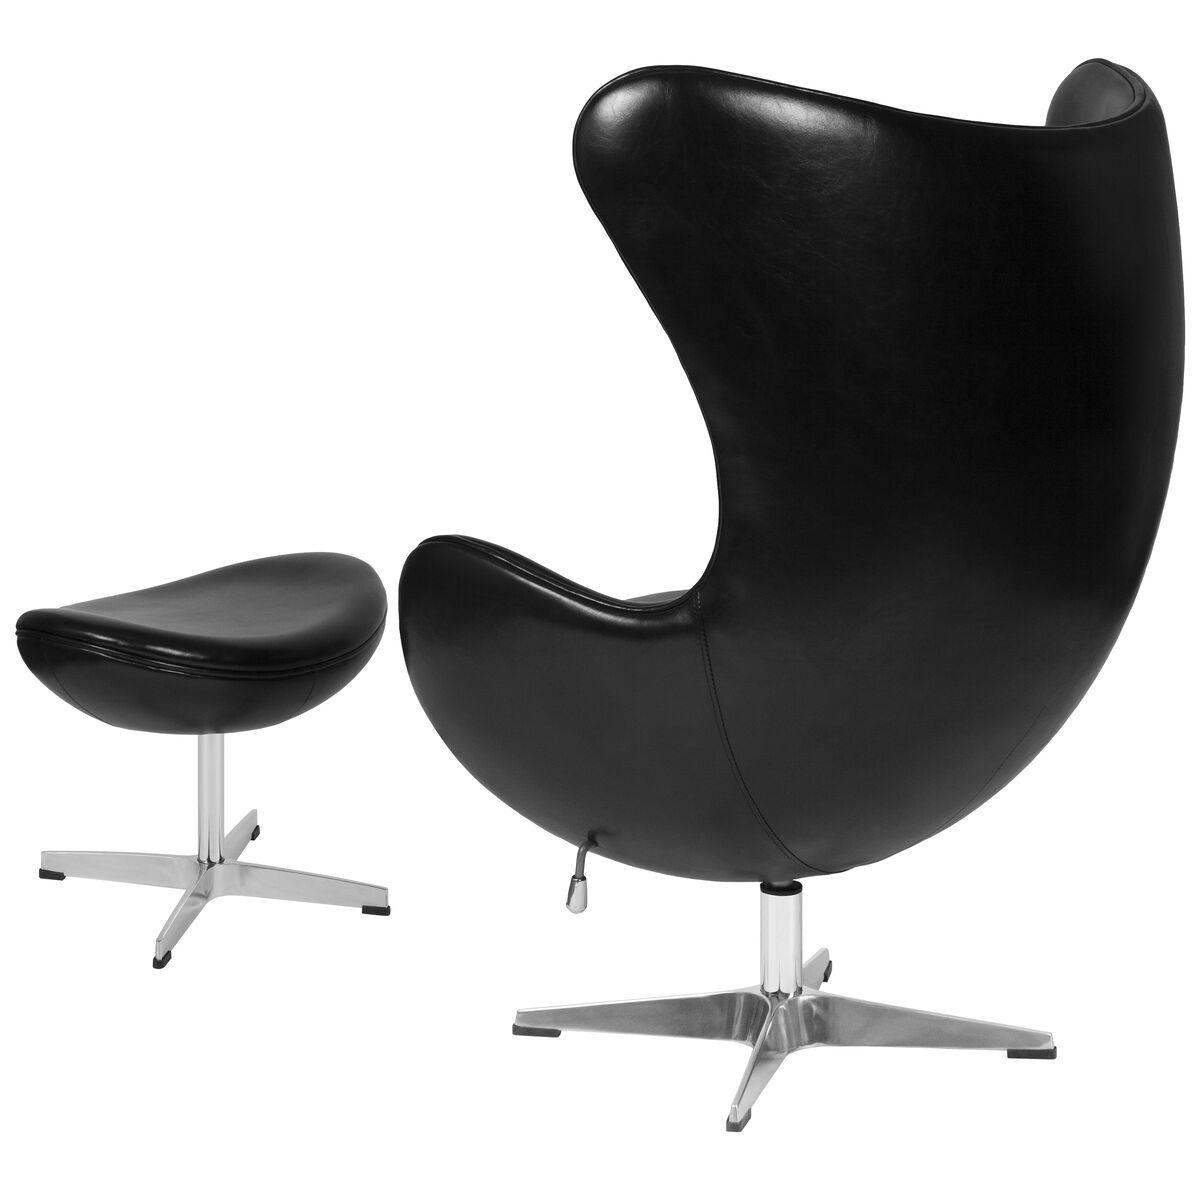 Enjoyable Black Leather Egg Chair With Tilt Lock Mechanism And Ottoman Ibusinesslaw Wood Chair Design Ideas Ibusinesslaworg